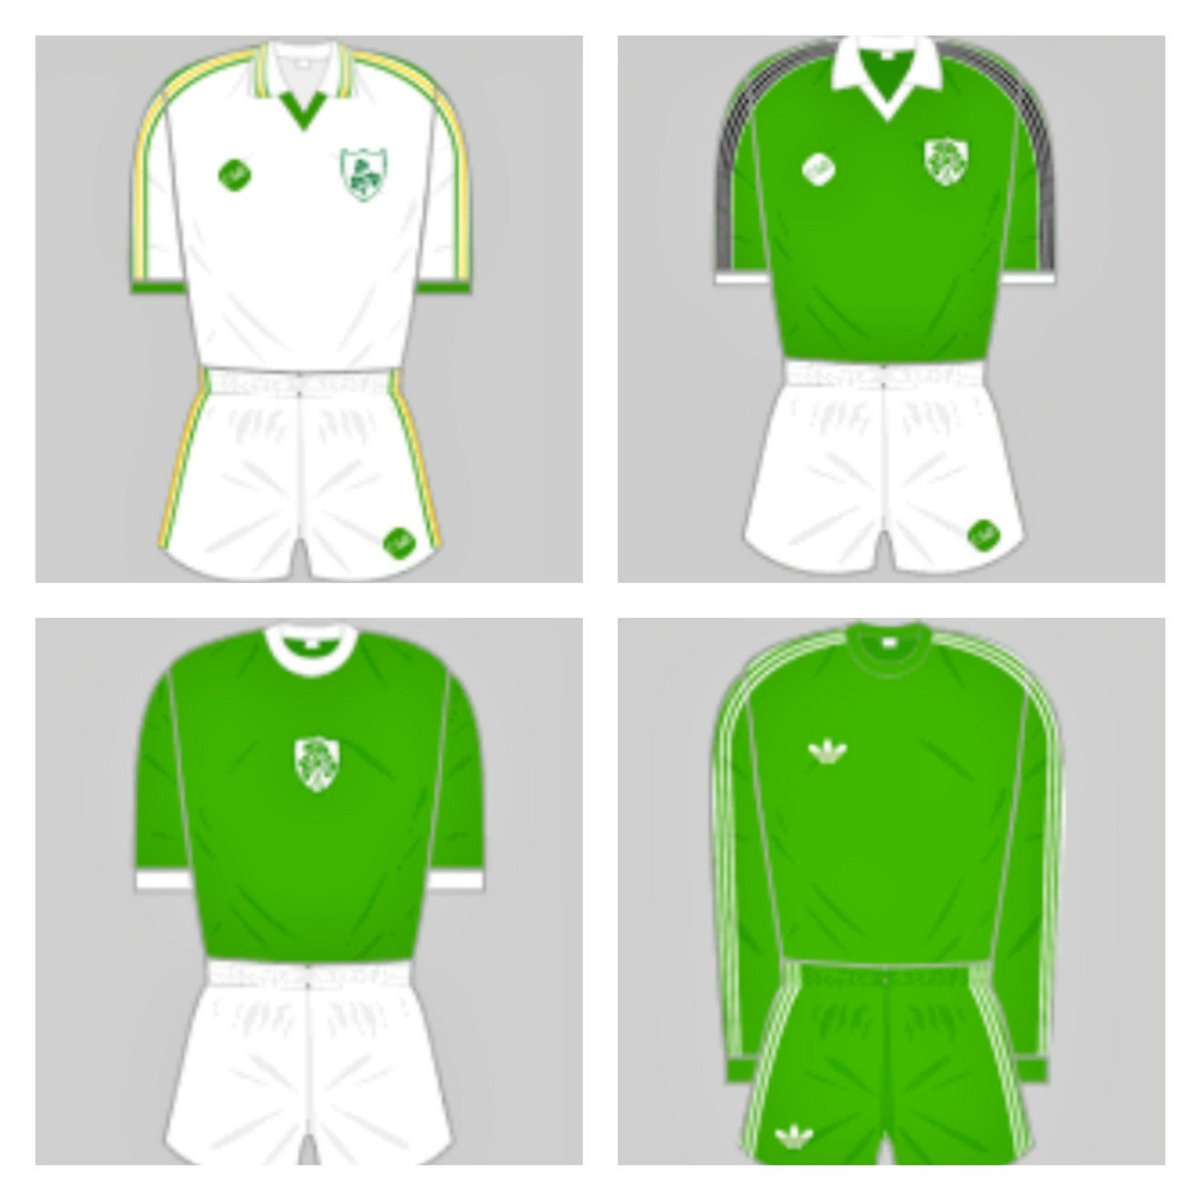 finest selection 0ce9f 07959 irelandsoccershirts on Twitter: